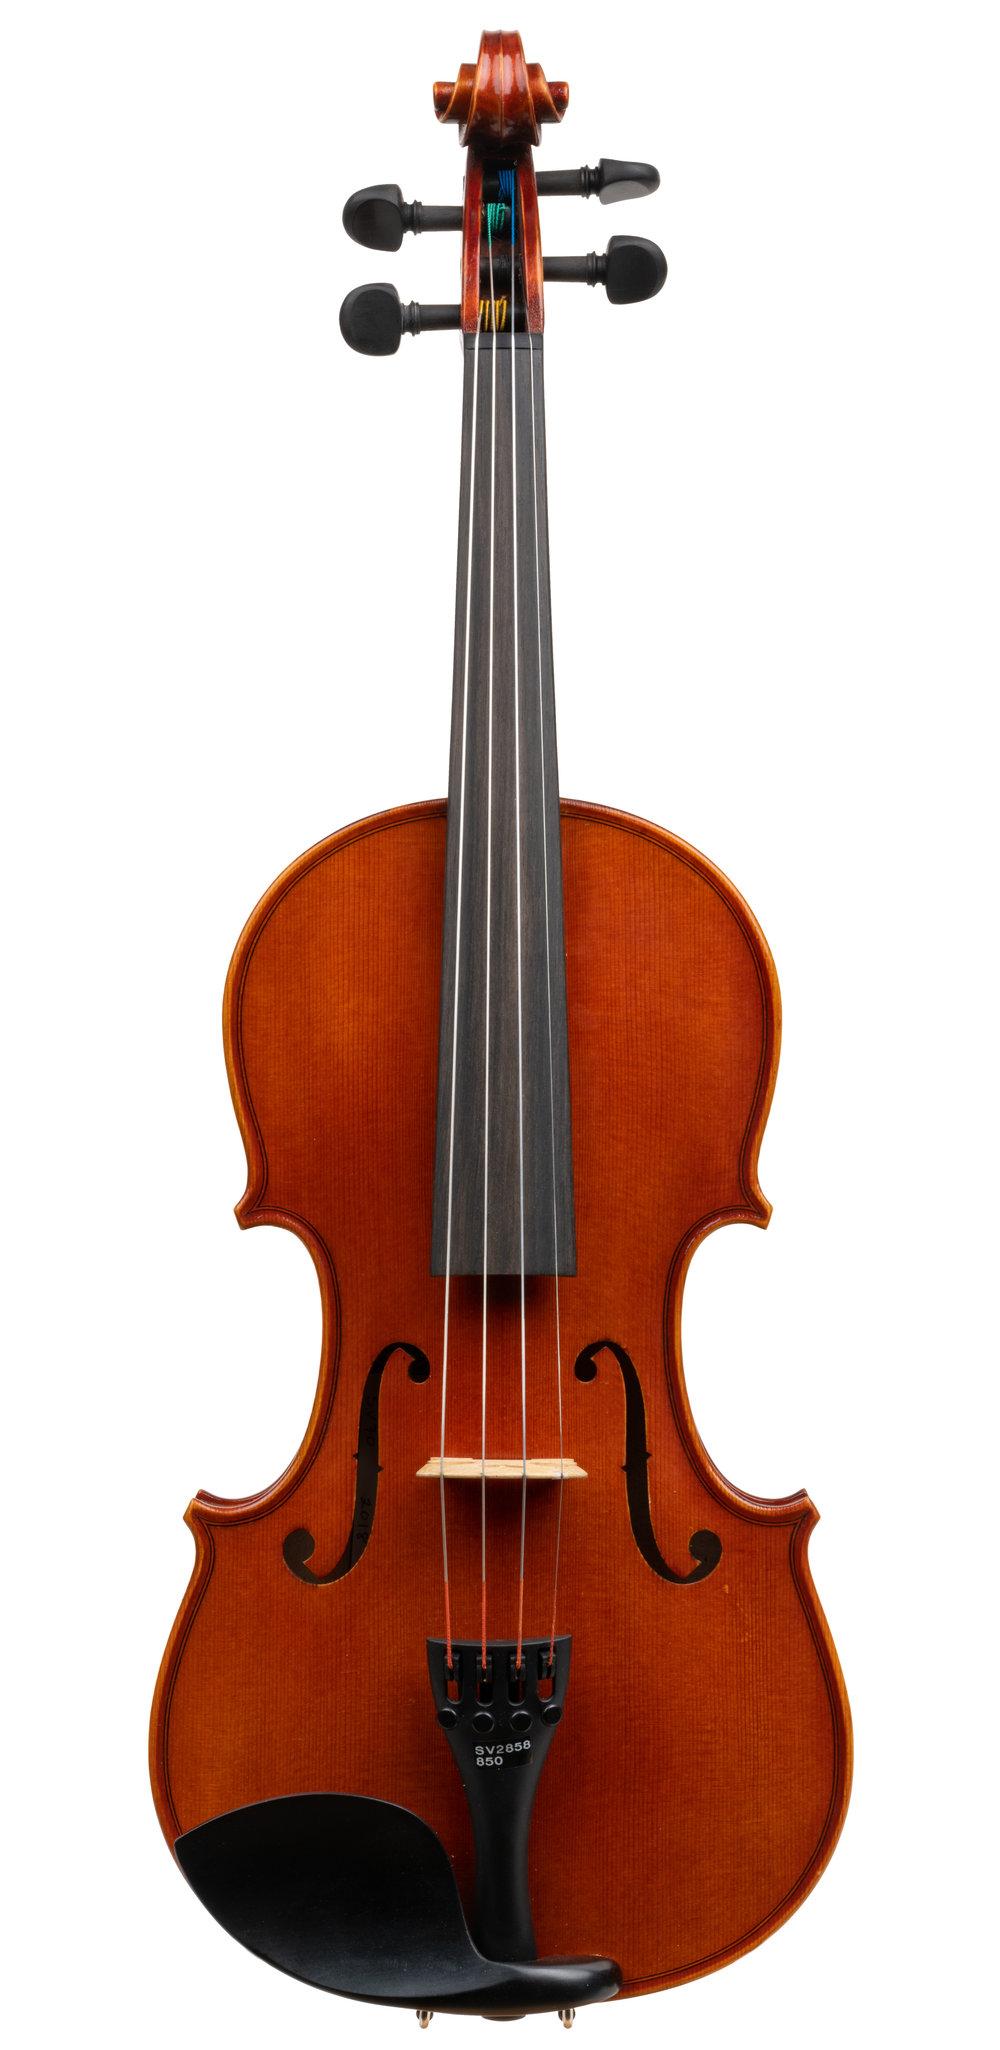 Seman Violins SV70 outfit -